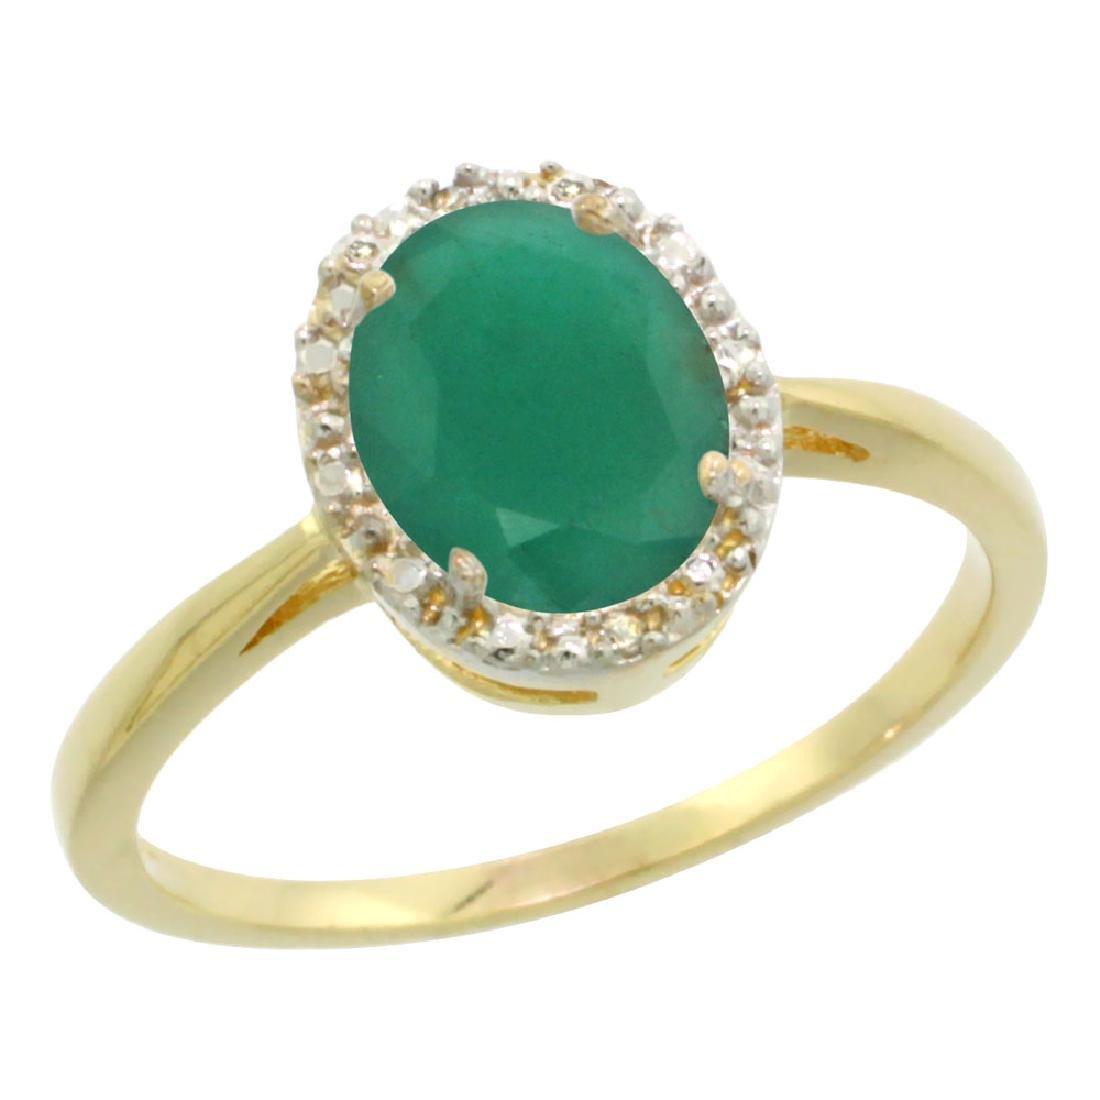 Natural 1.52 ctw Emerald & Diamond Engagement Ring 14K